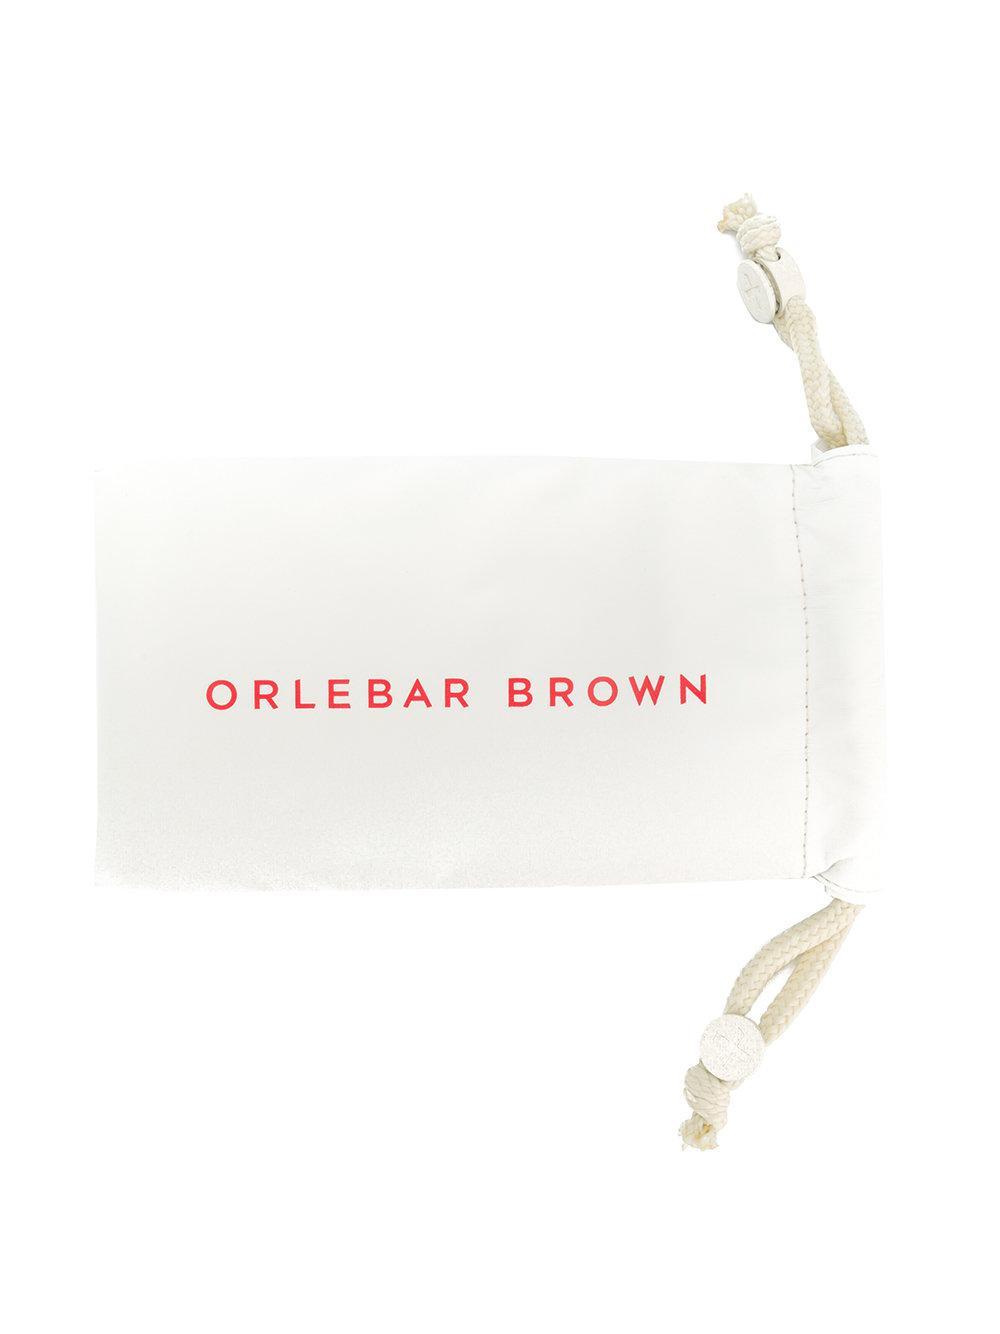 Orlebar Brown Round Frame Sunglasses in Blue for Men